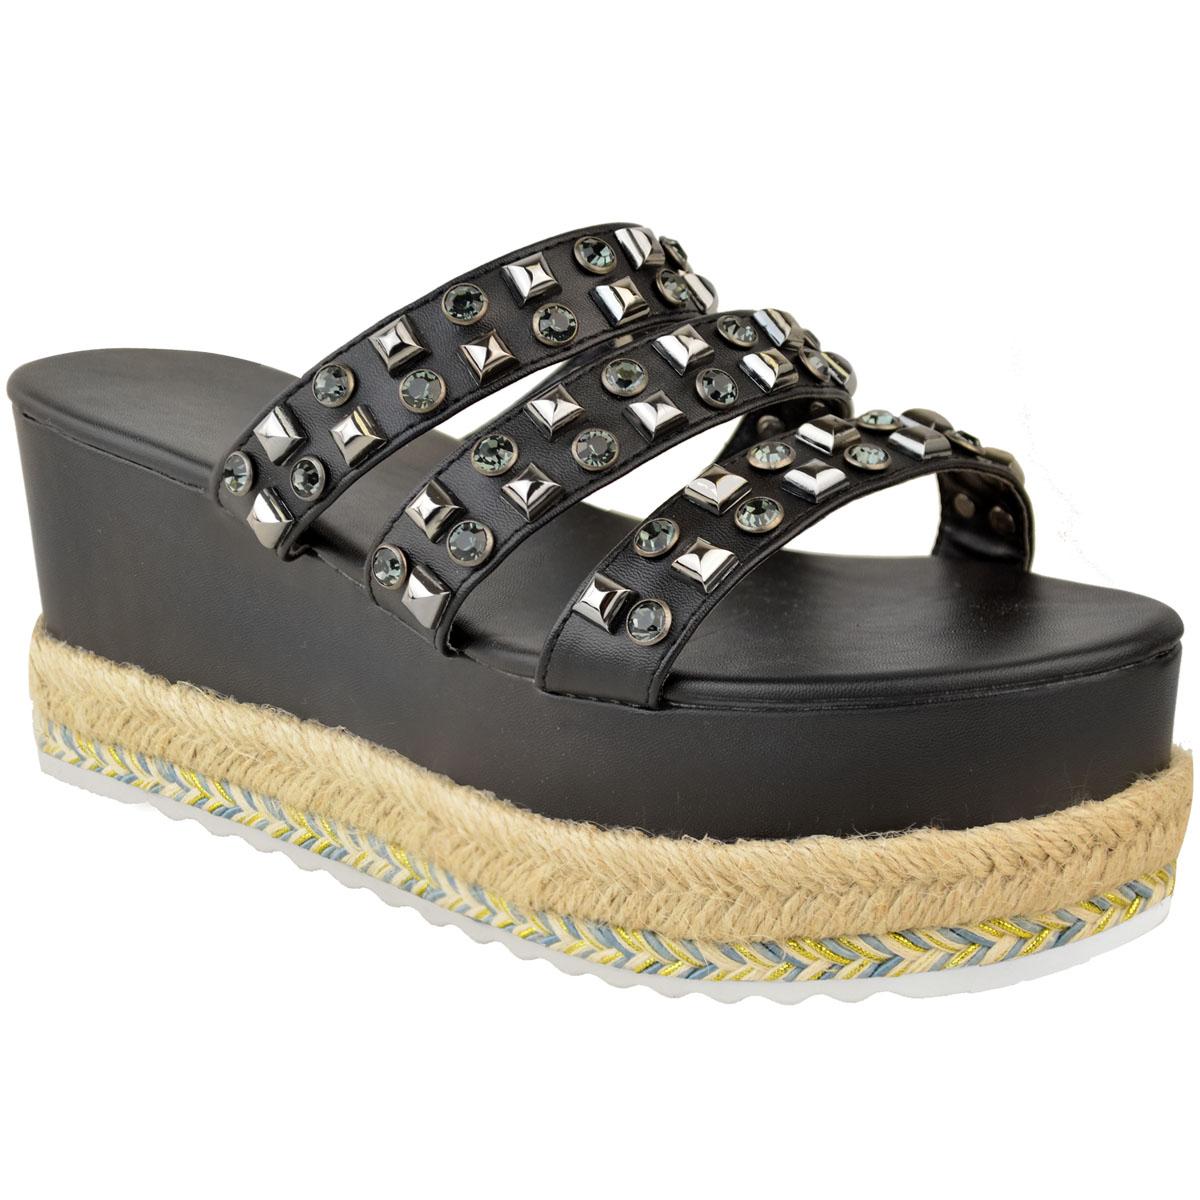 Womens-Ladies-Flatforms-Sandals-Espadrilles-Embellished-Stud-Jewel-Wedges-Size